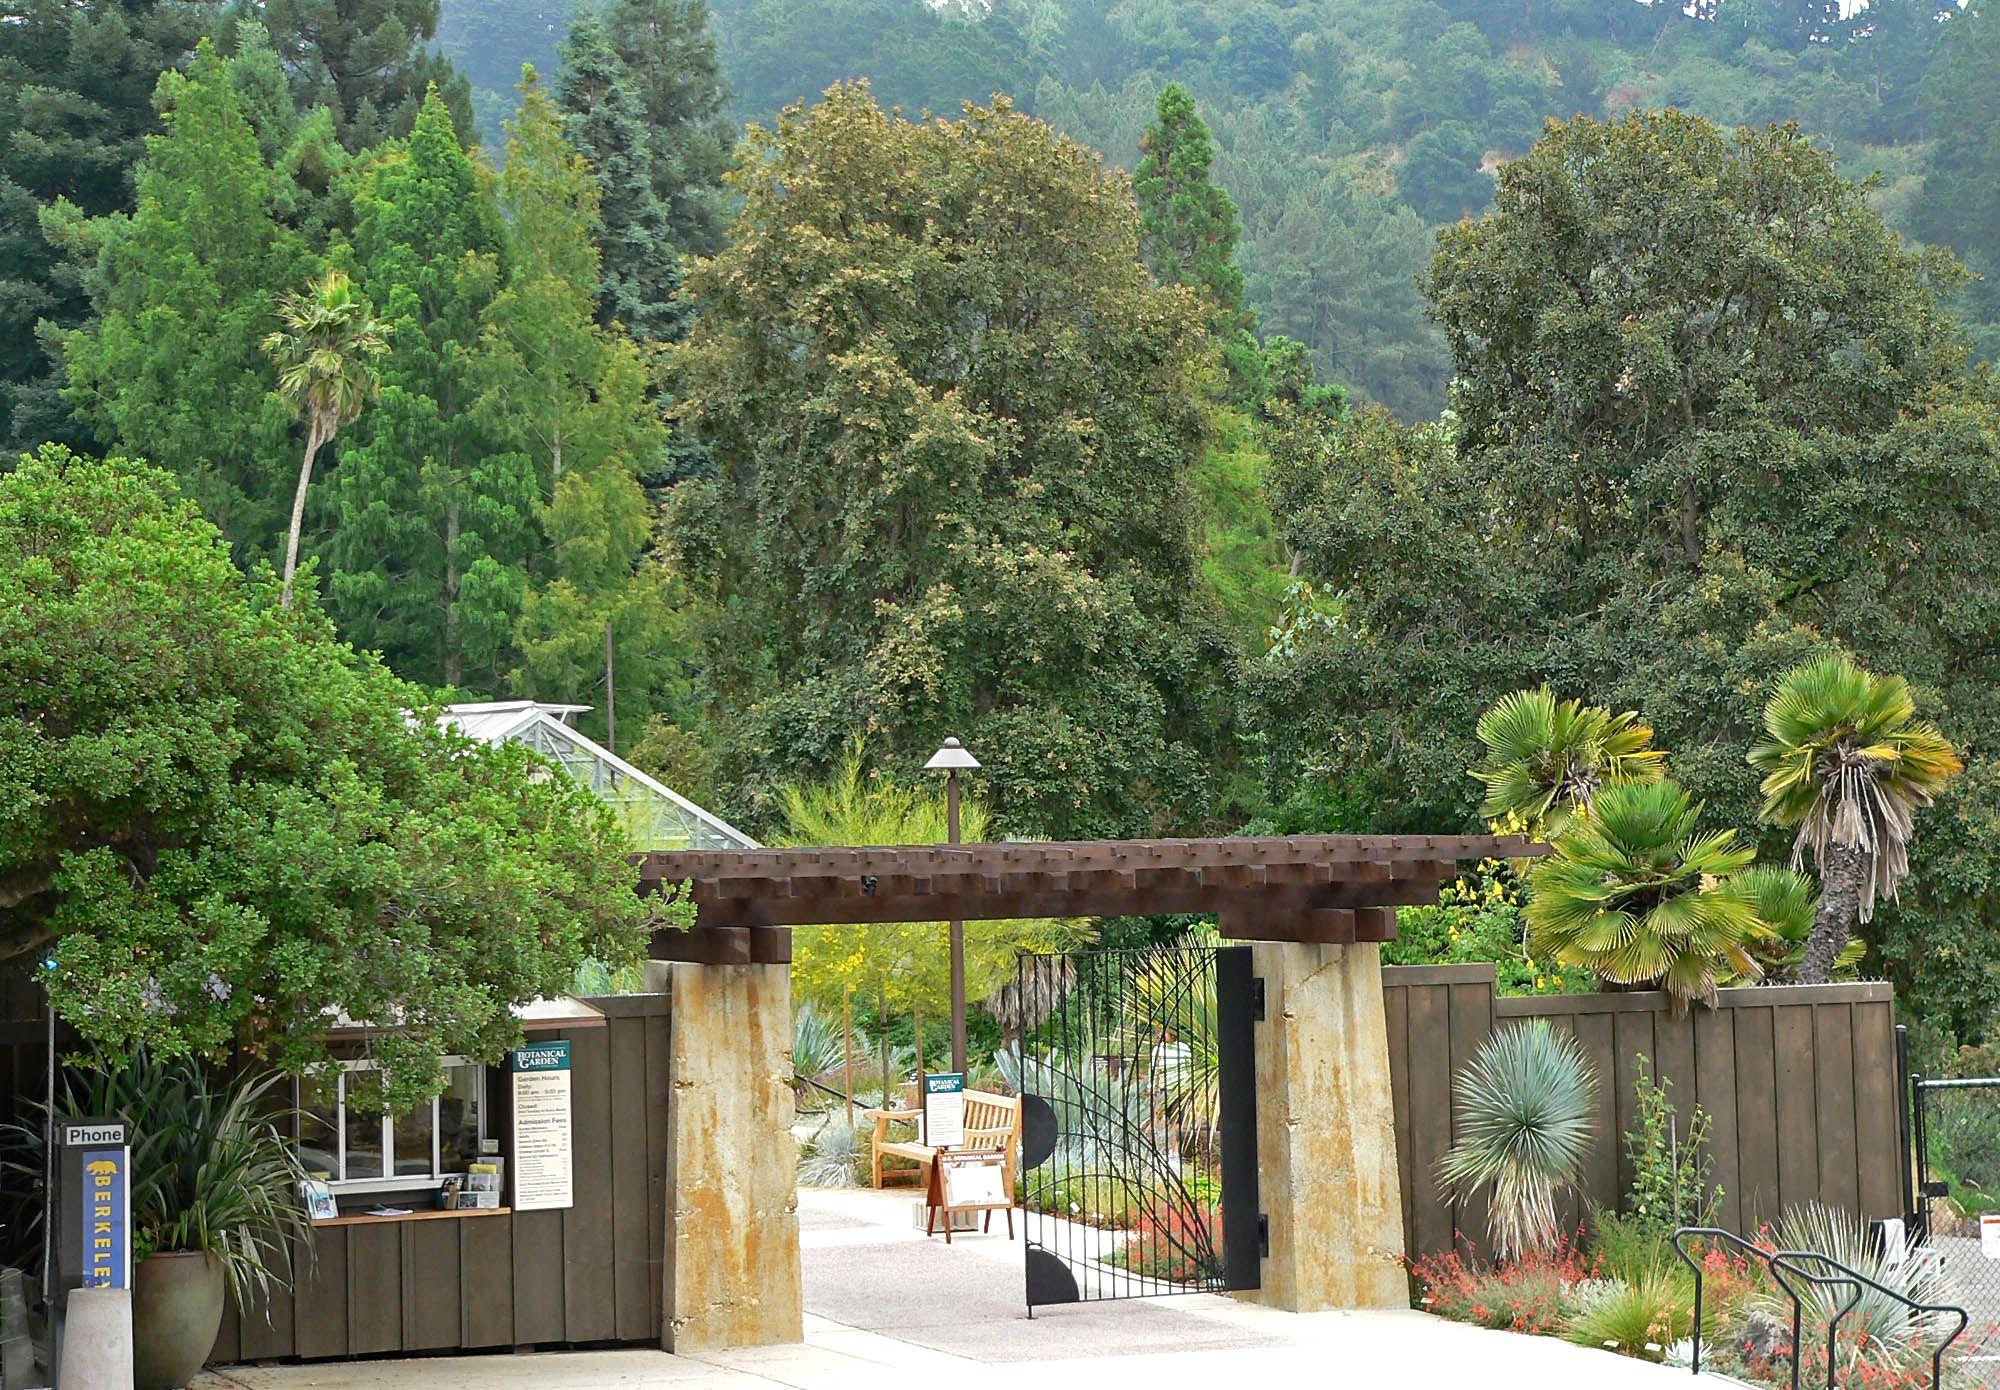 UCBG The University of California Botanical Garden is a